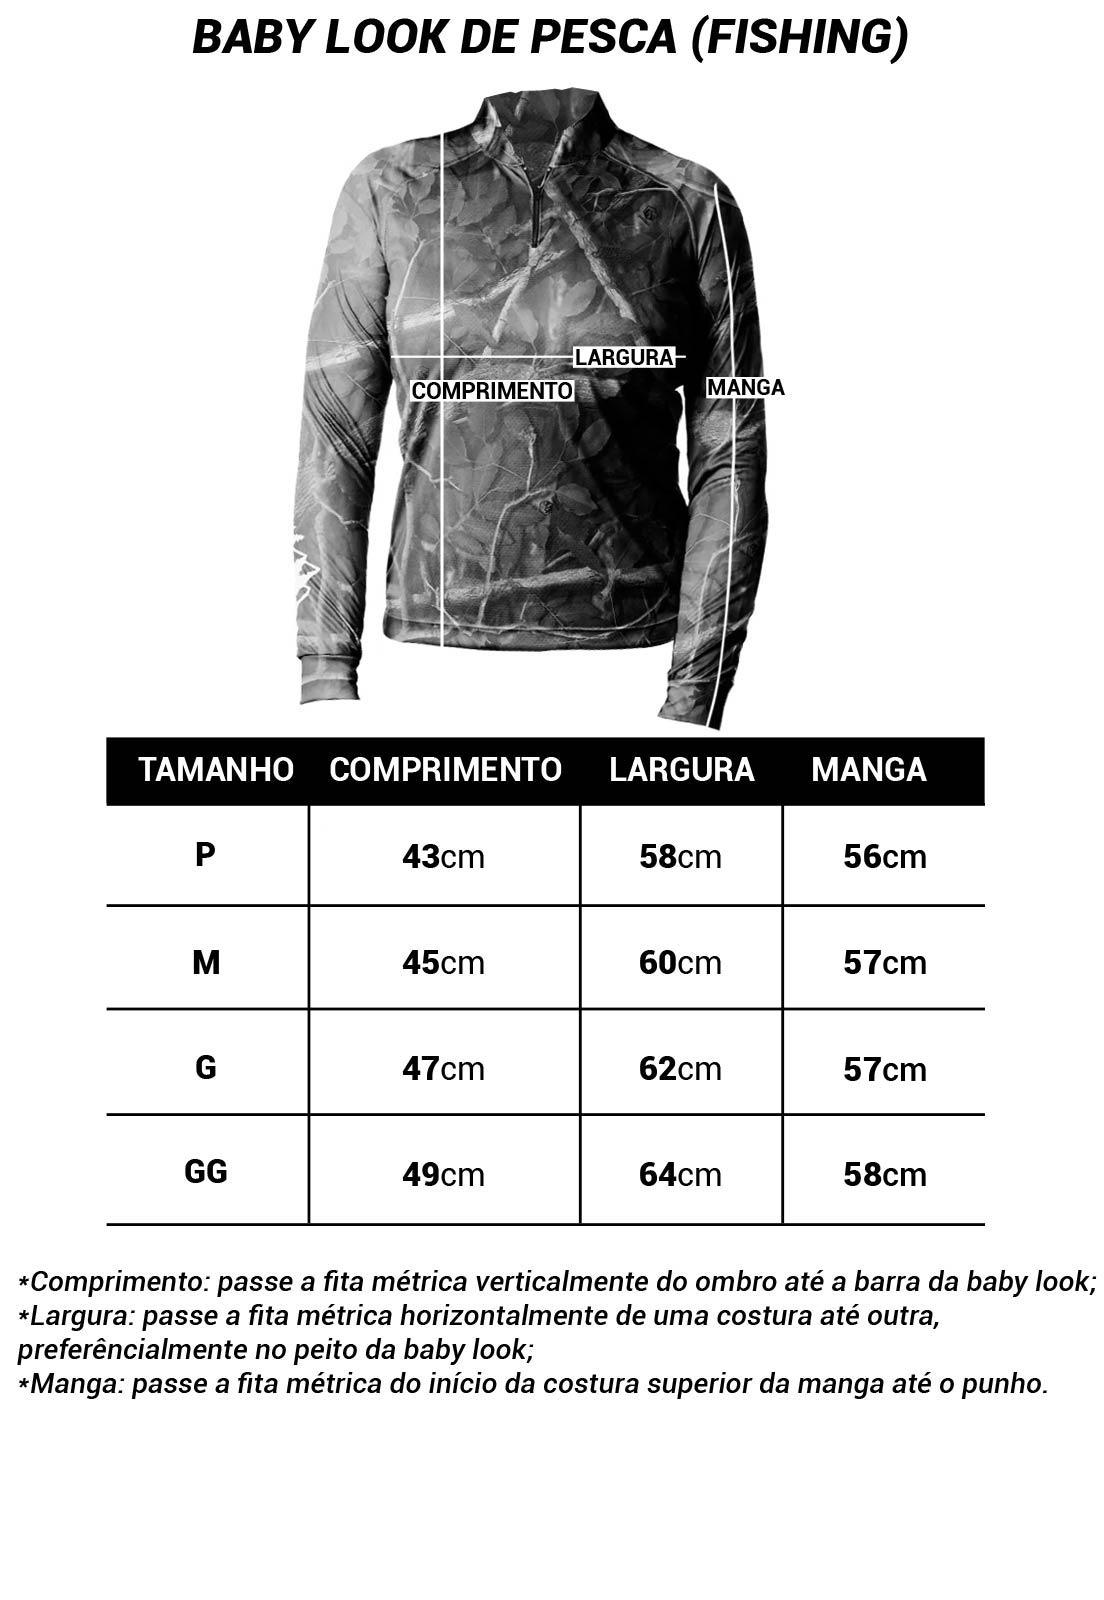 CAMISA DE PESCA FISH CAMUFLADA PRO 21 FEMININA + BANDANA GRÁTIS  - Real Hunter